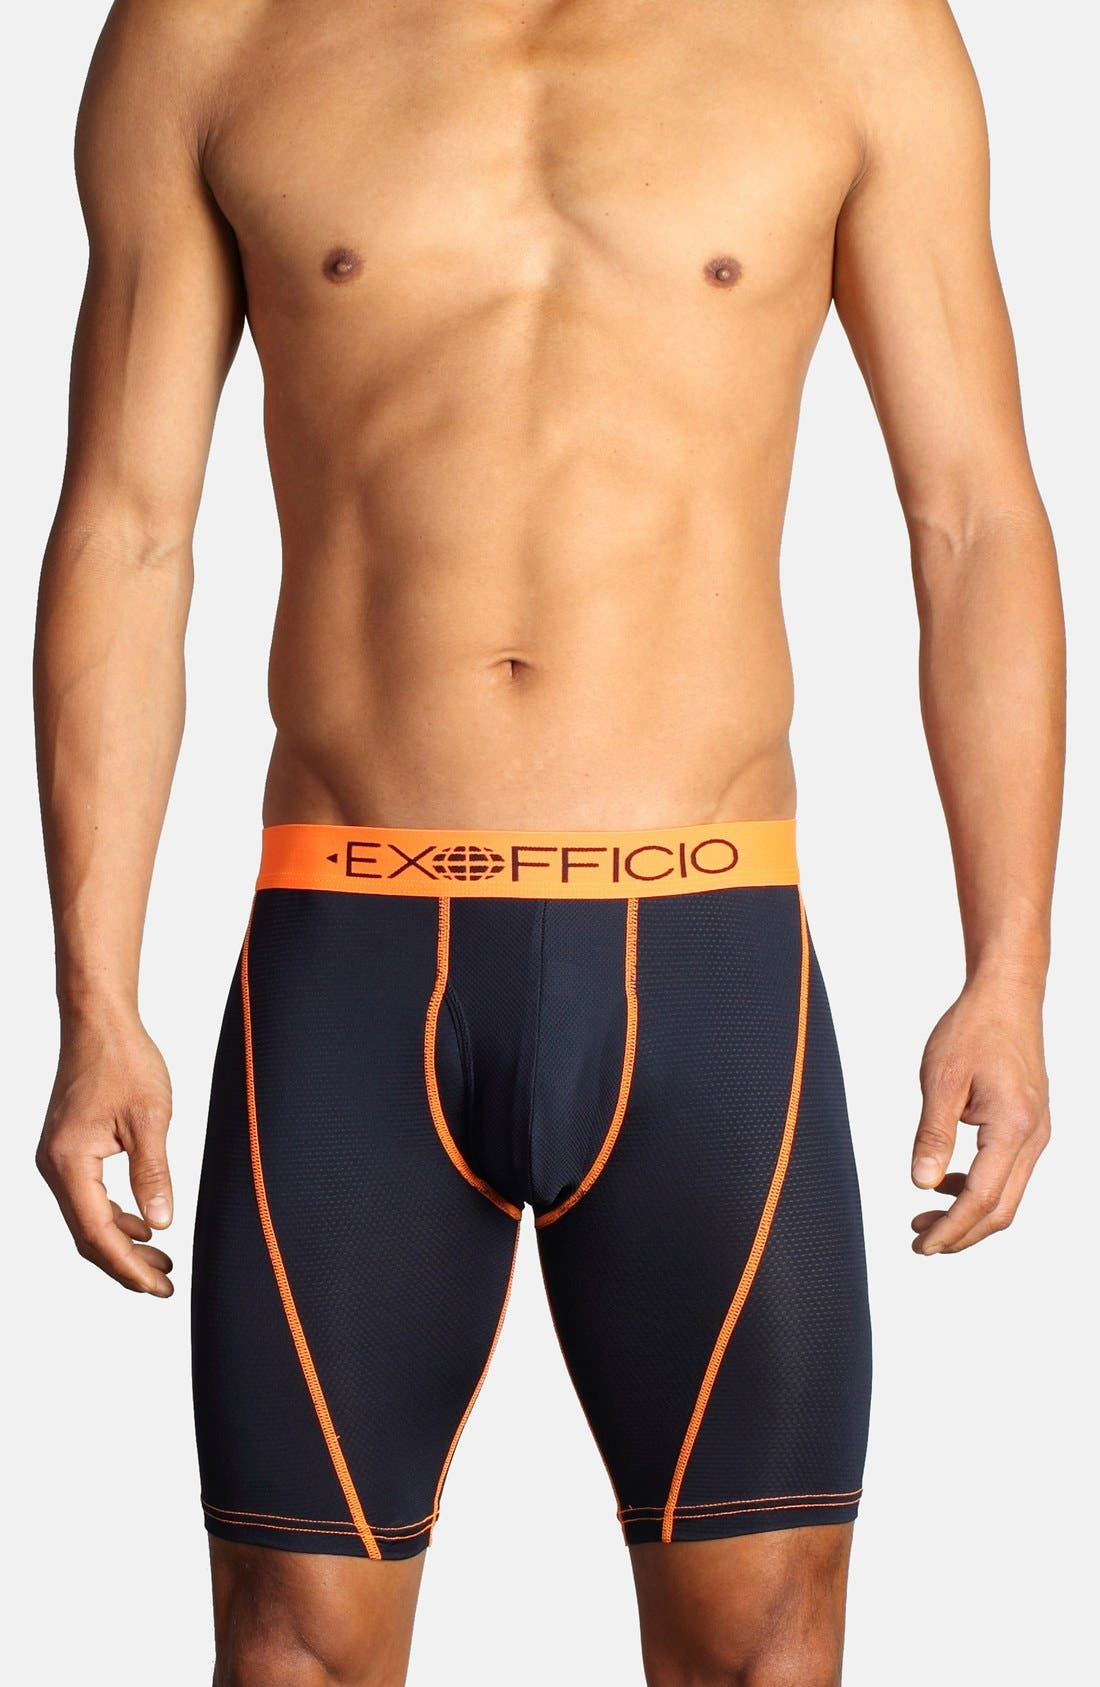 Ex Officio Give-N-Go Sport Mesh Boxer Briefs